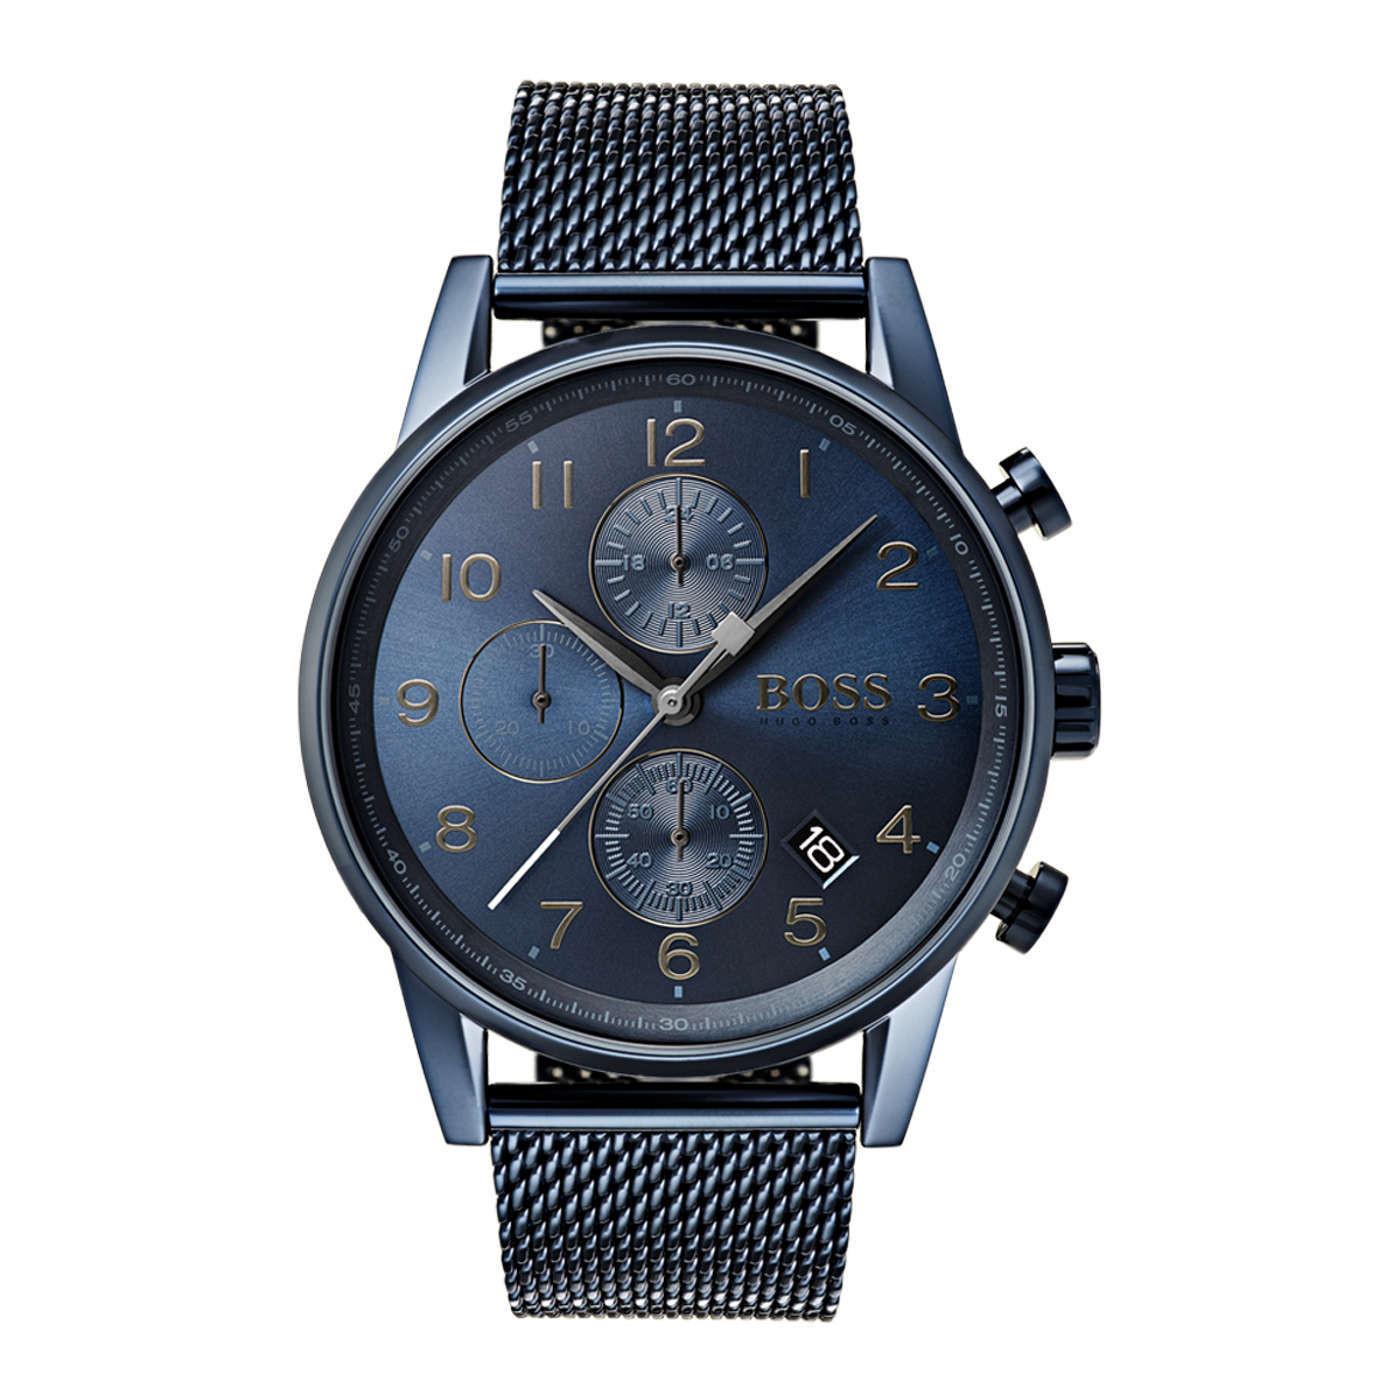 Hugo Boss Black Navigator Chronograaf horloge HB1513538